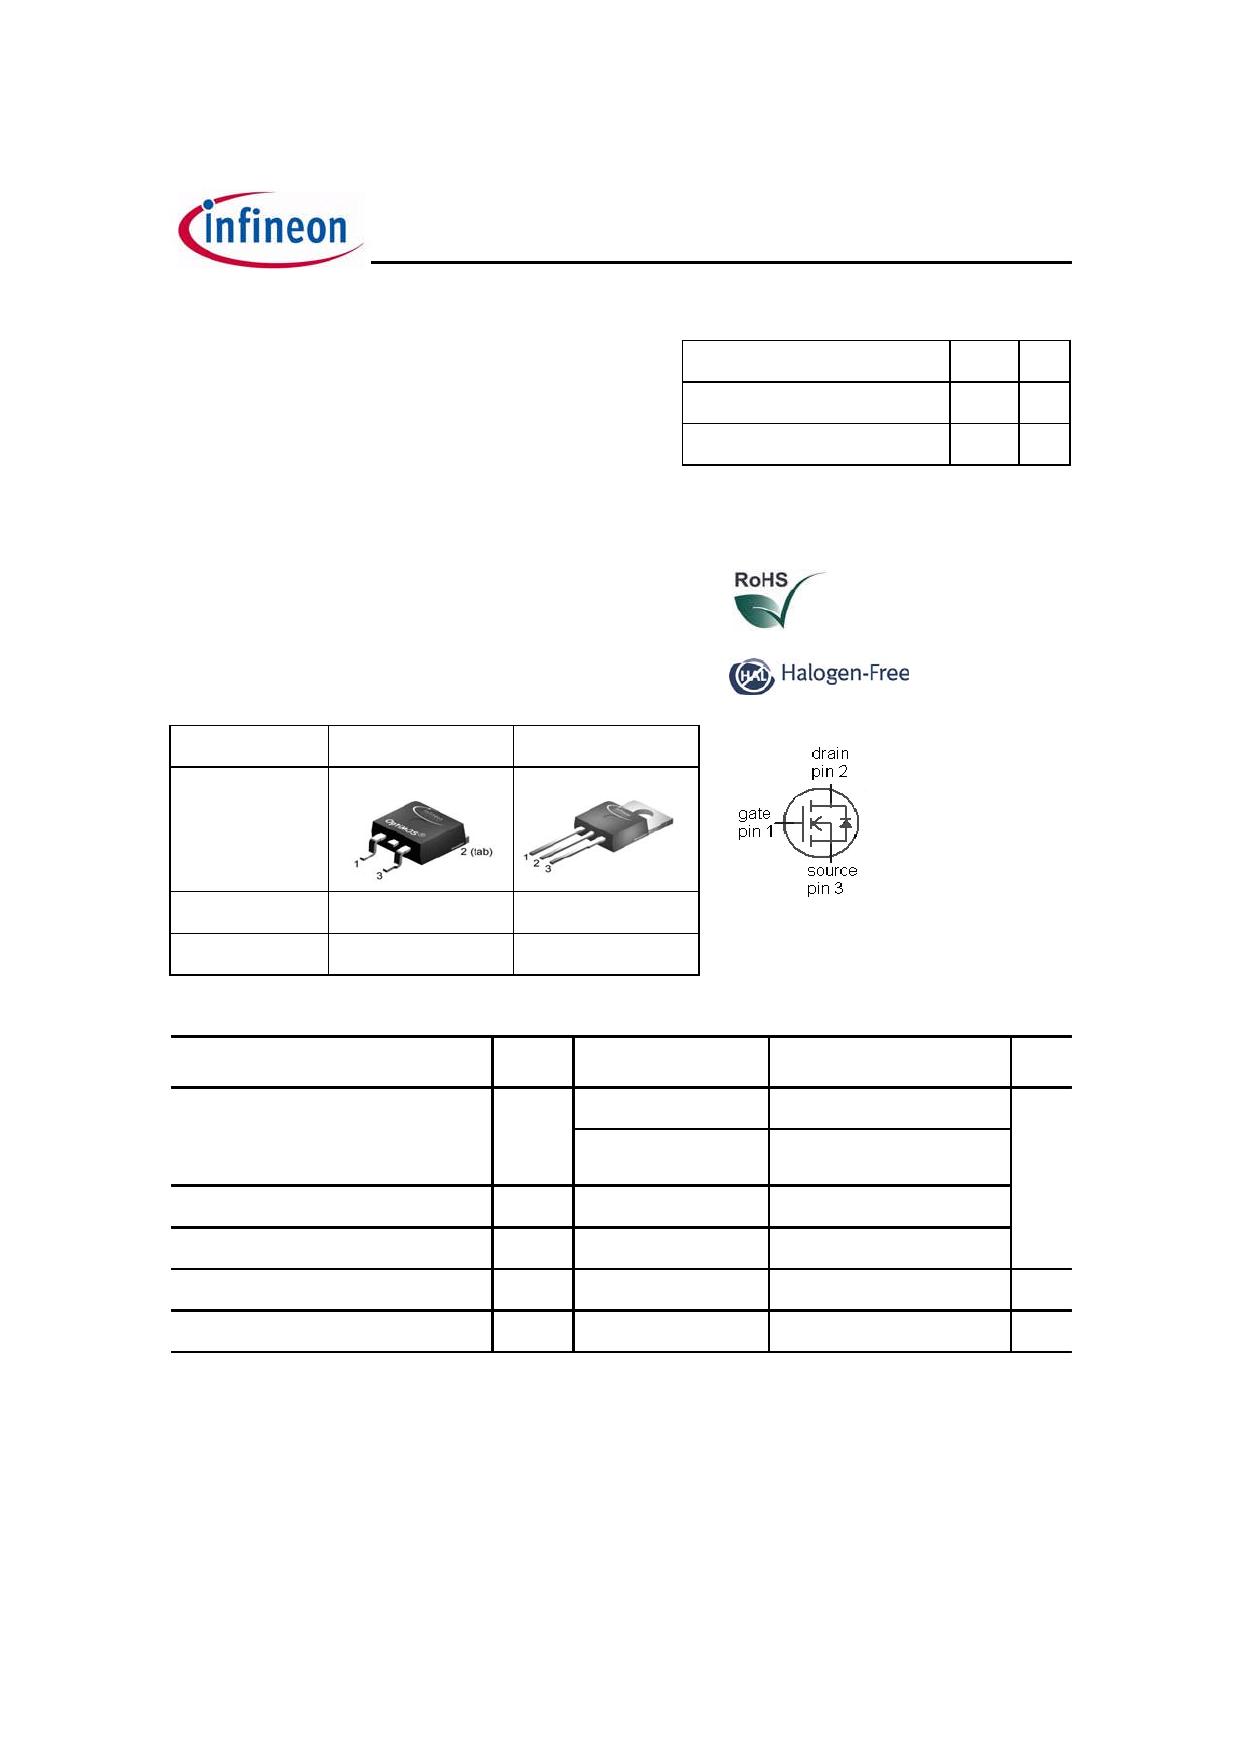 IPP023N04NG datasheet